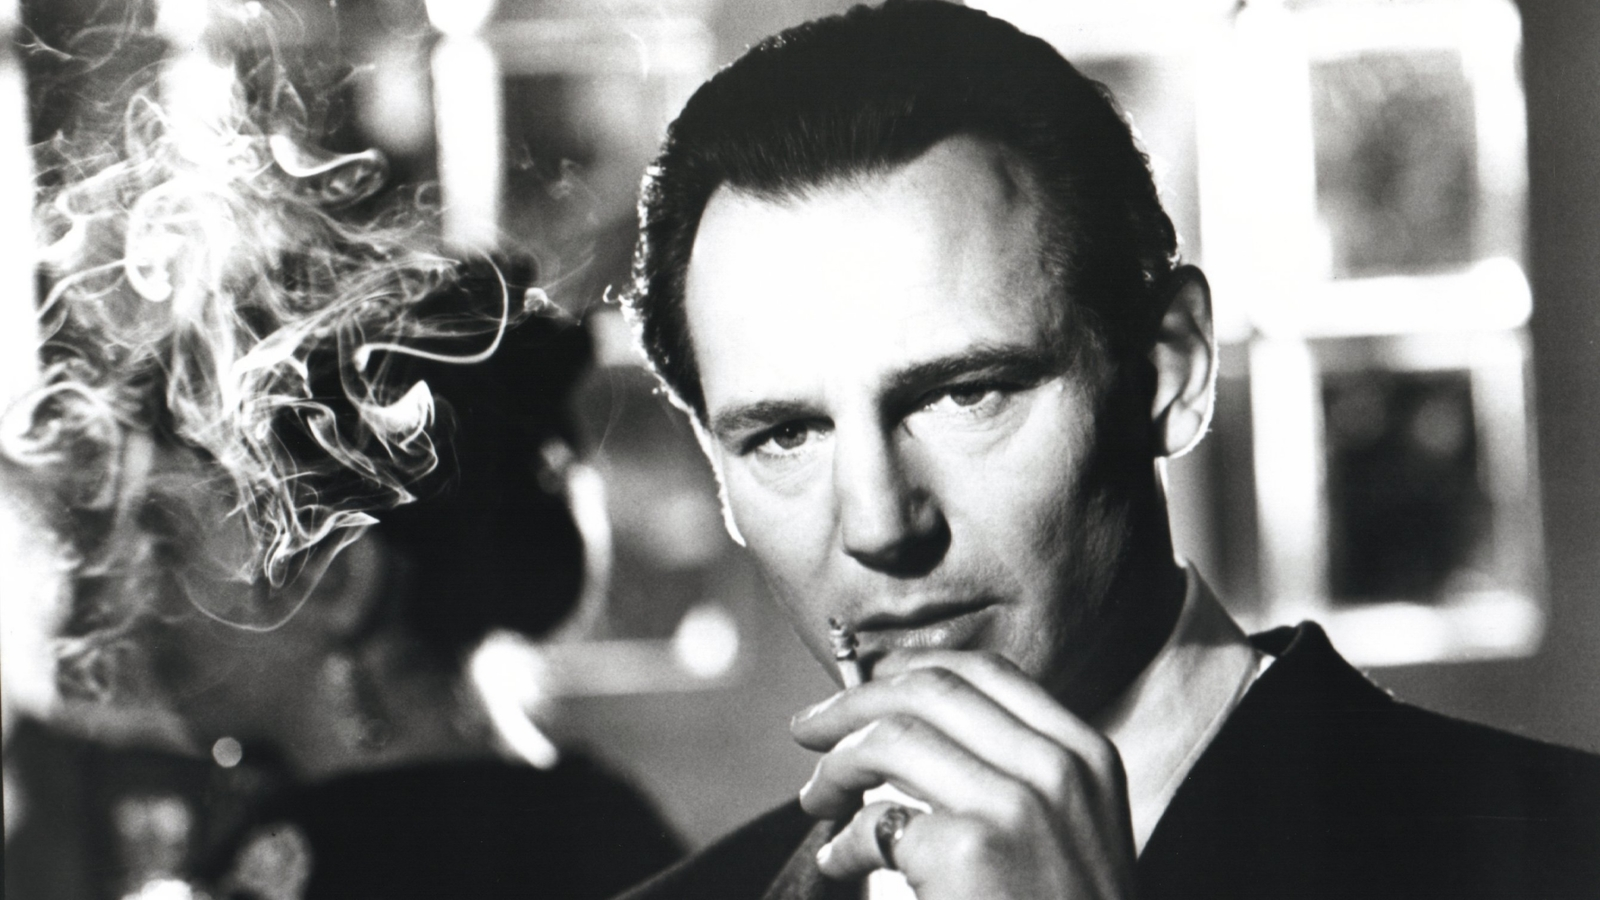 Liam Neeson's 25 most memorable roles